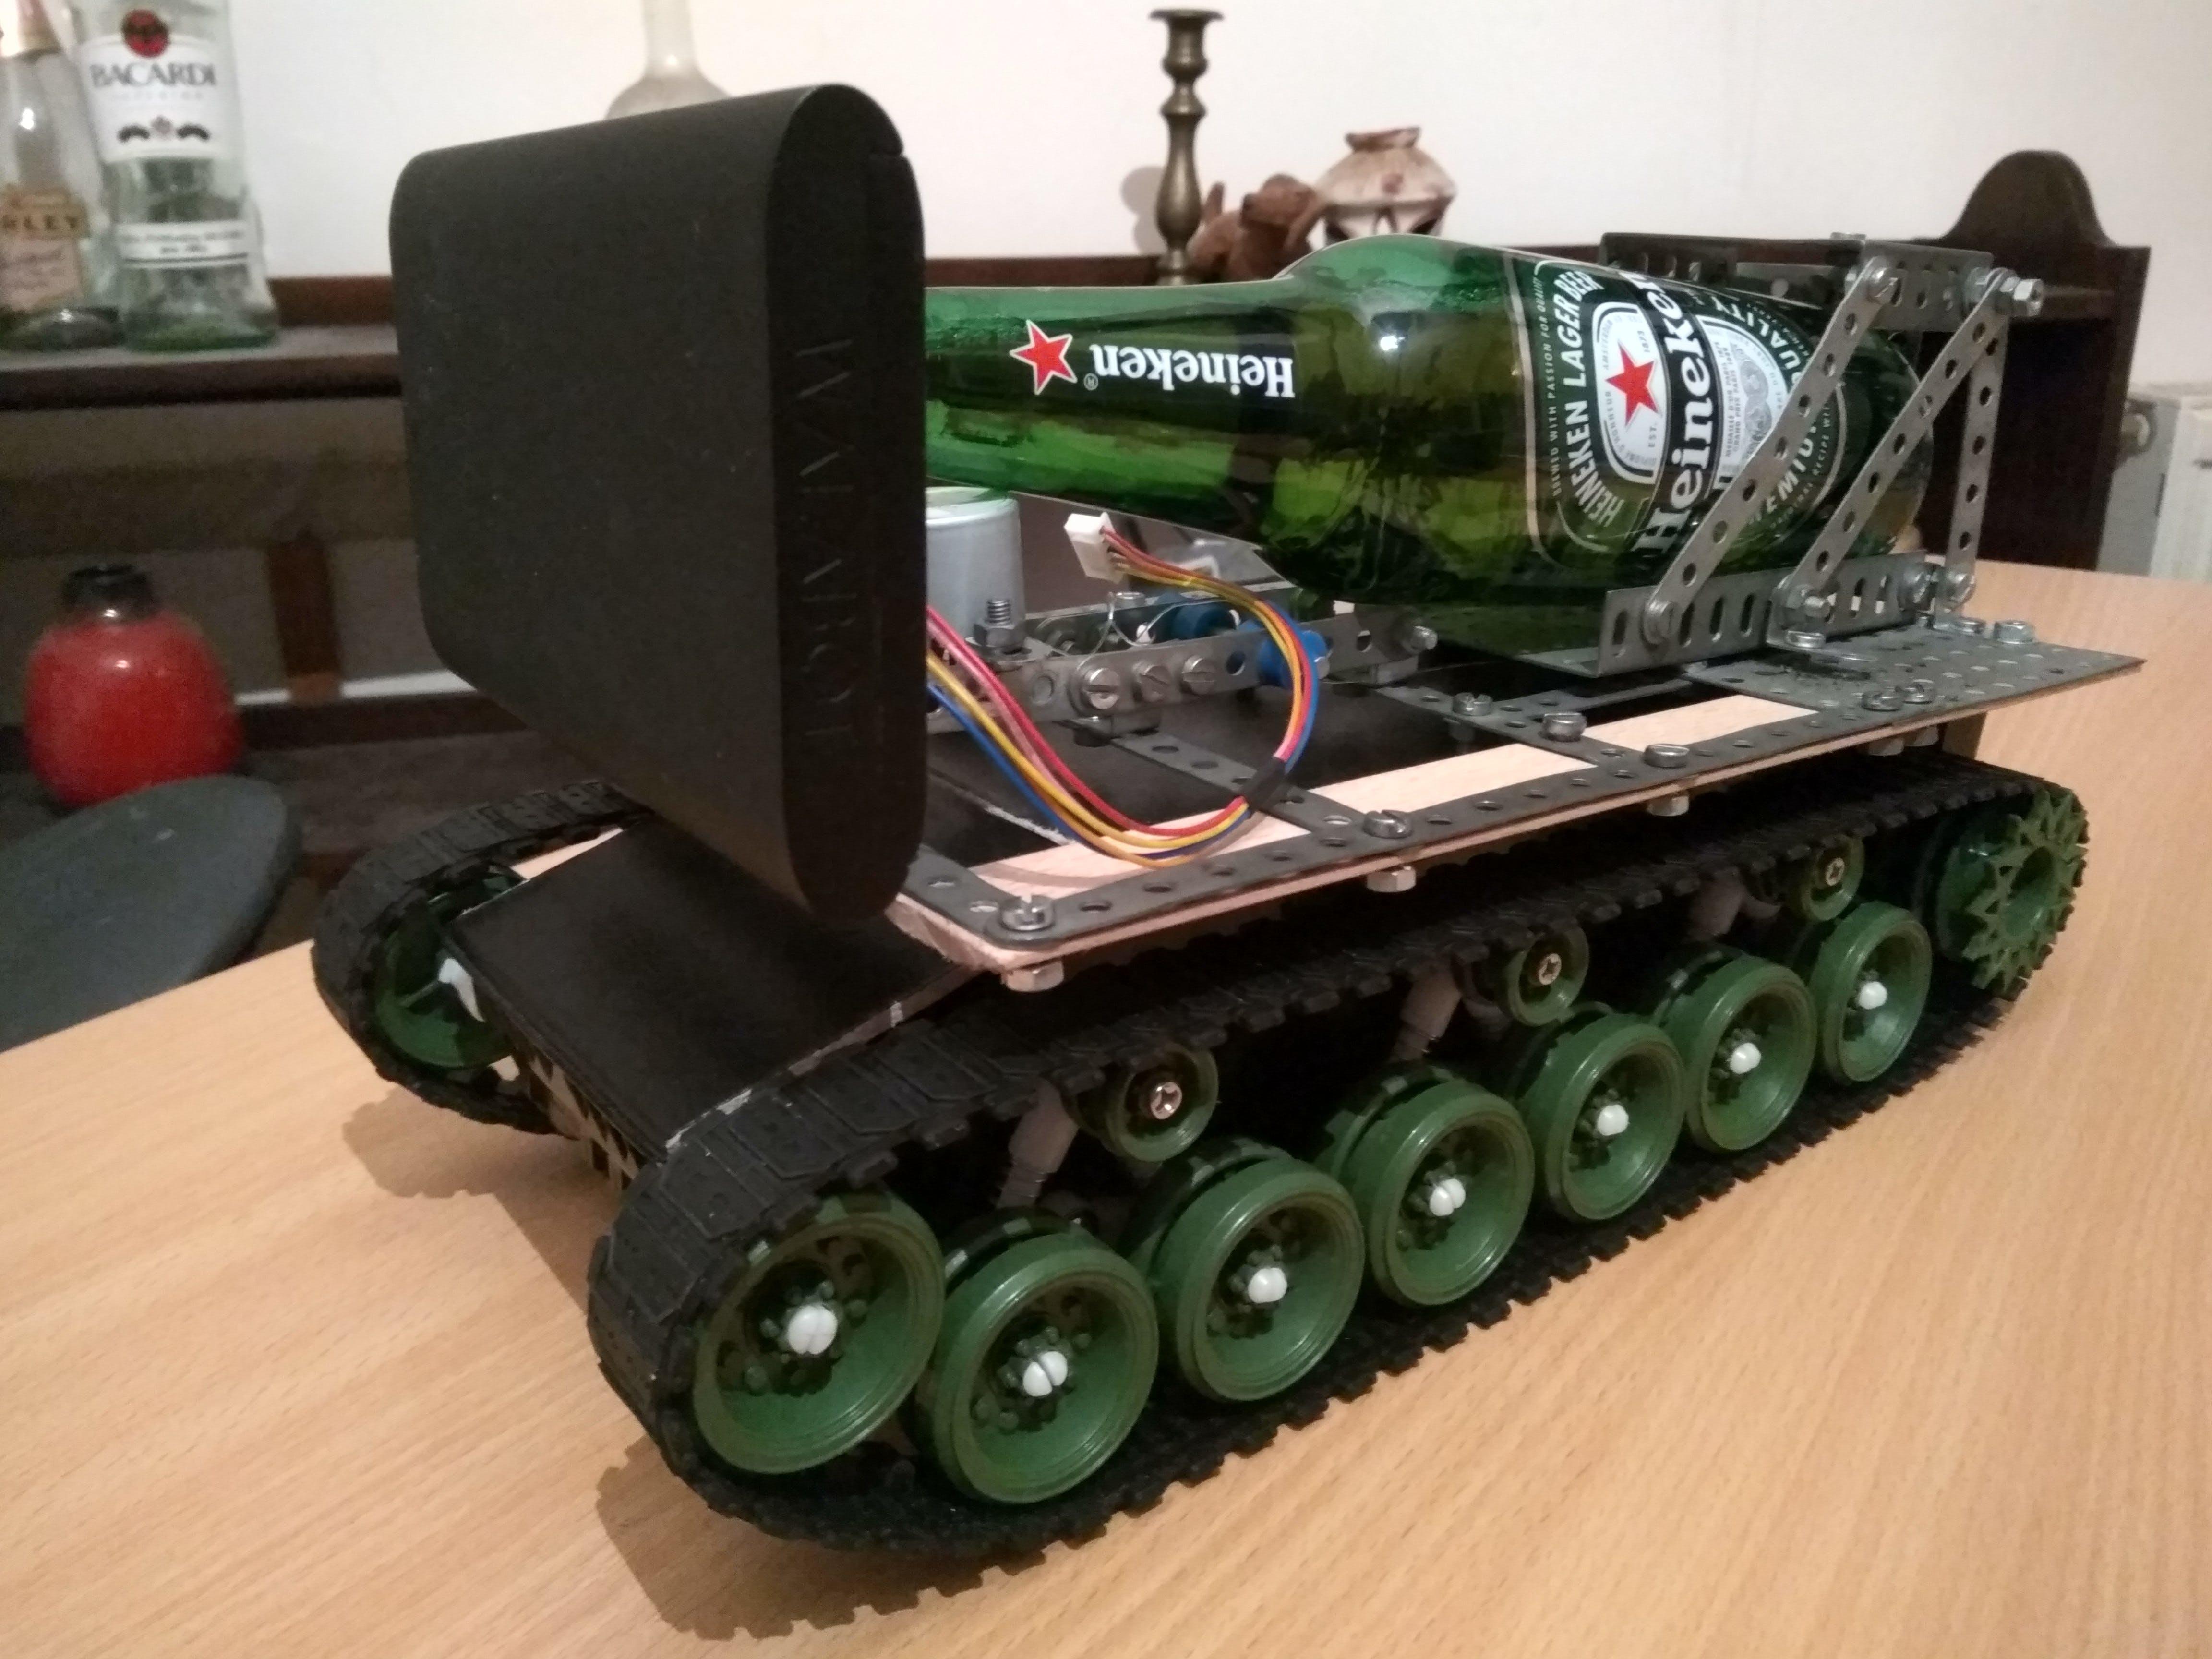 Walabot is mounted